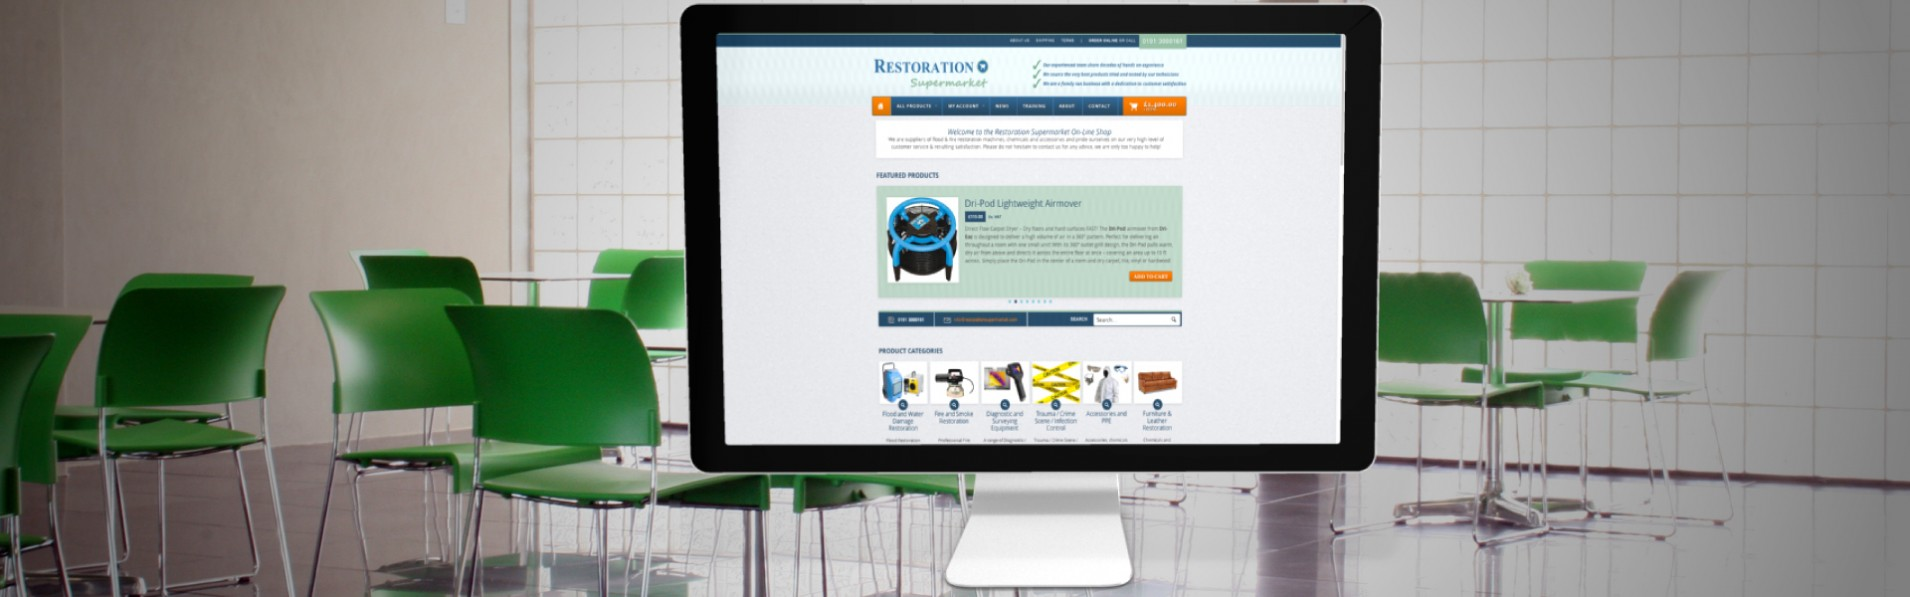 portfolio new1RSM1 - Webdesign for Land Rover car dealership